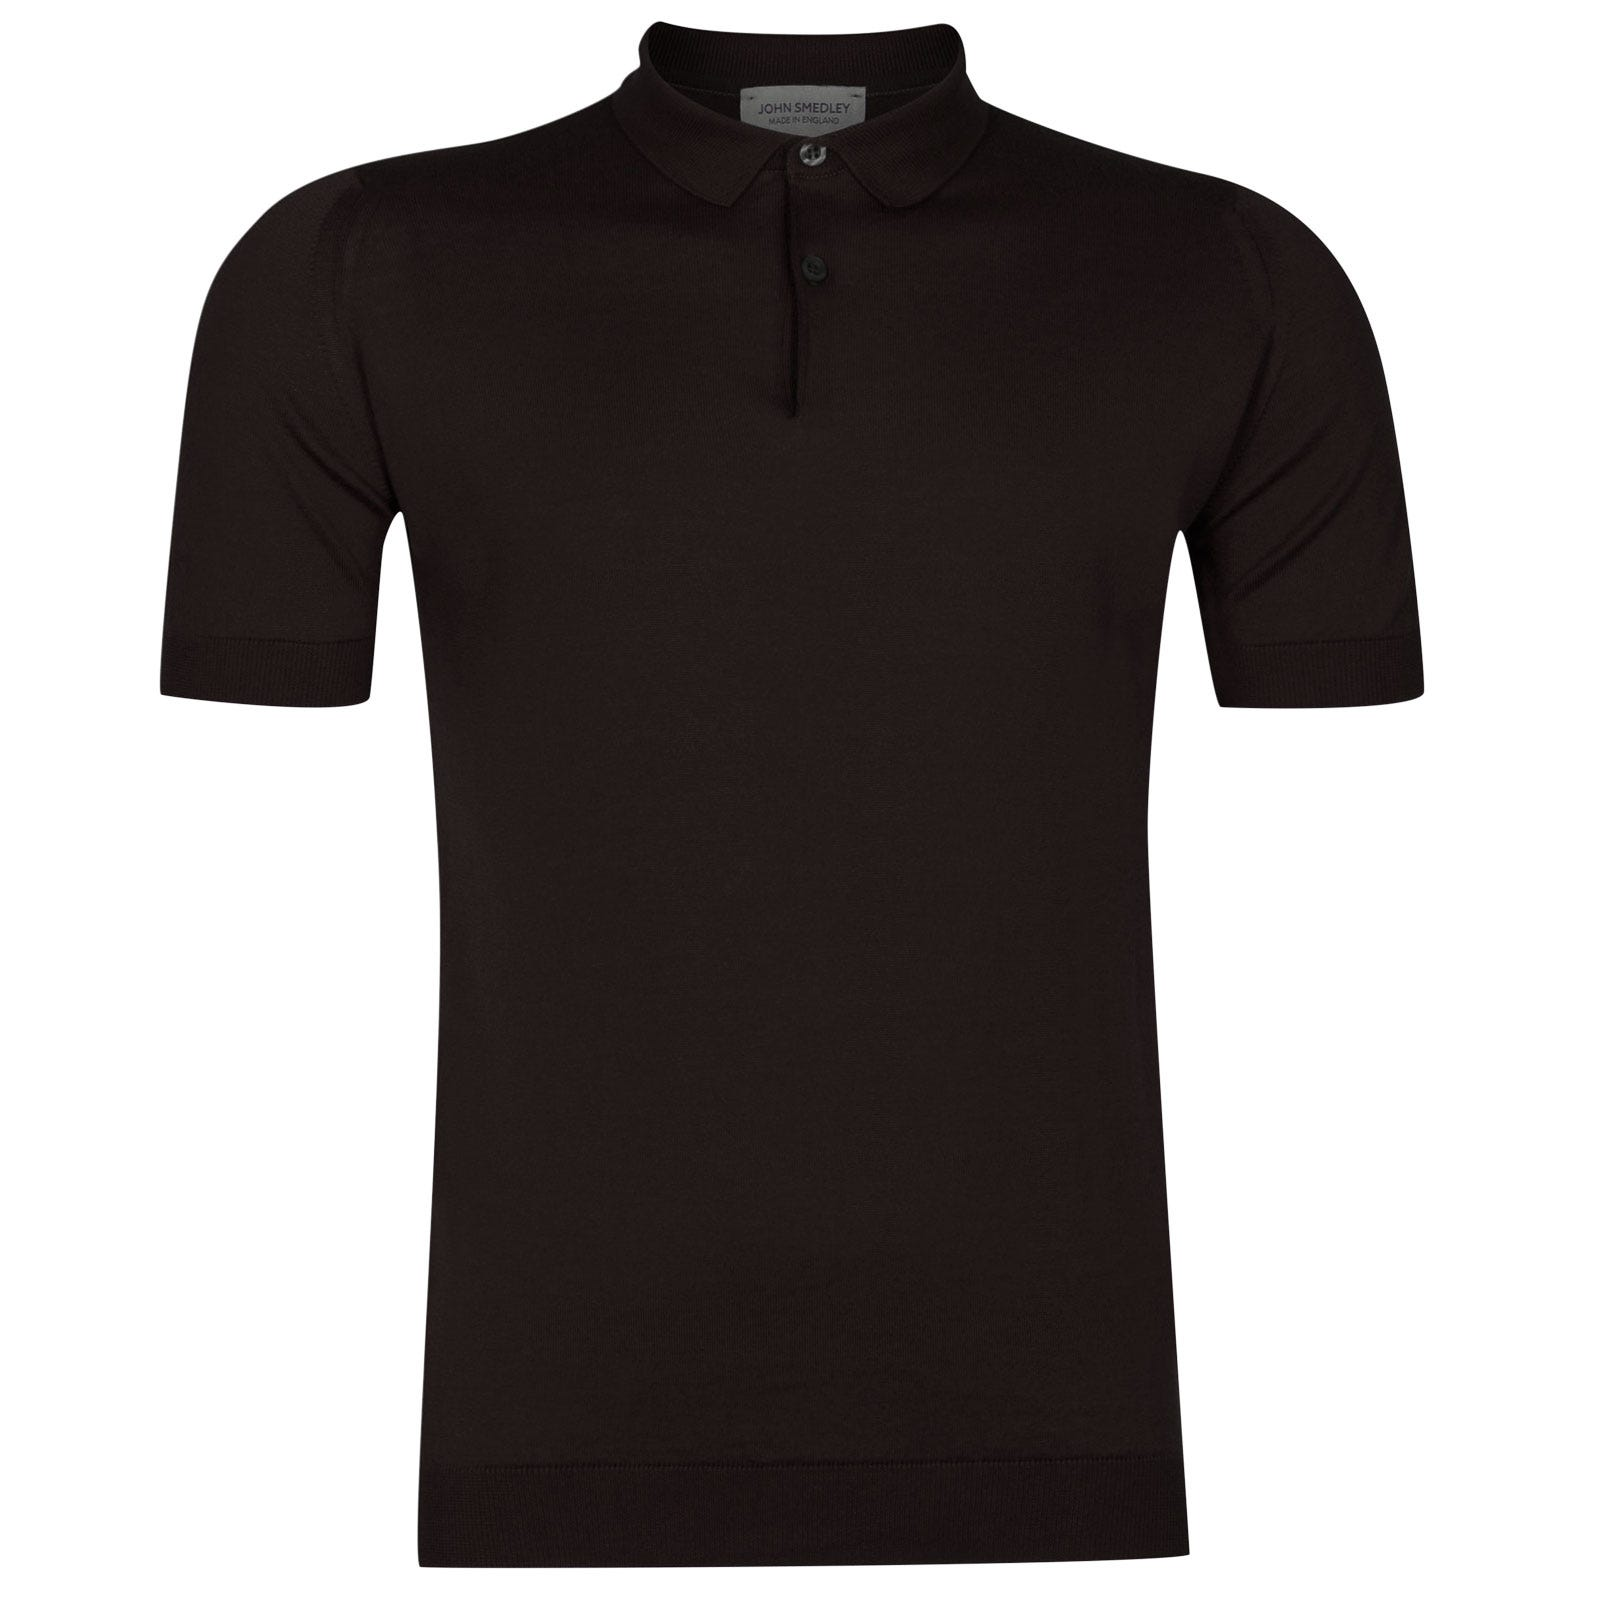 John Smedley Rhodes Sea Island Cotton Shirt in Dark Leather-S